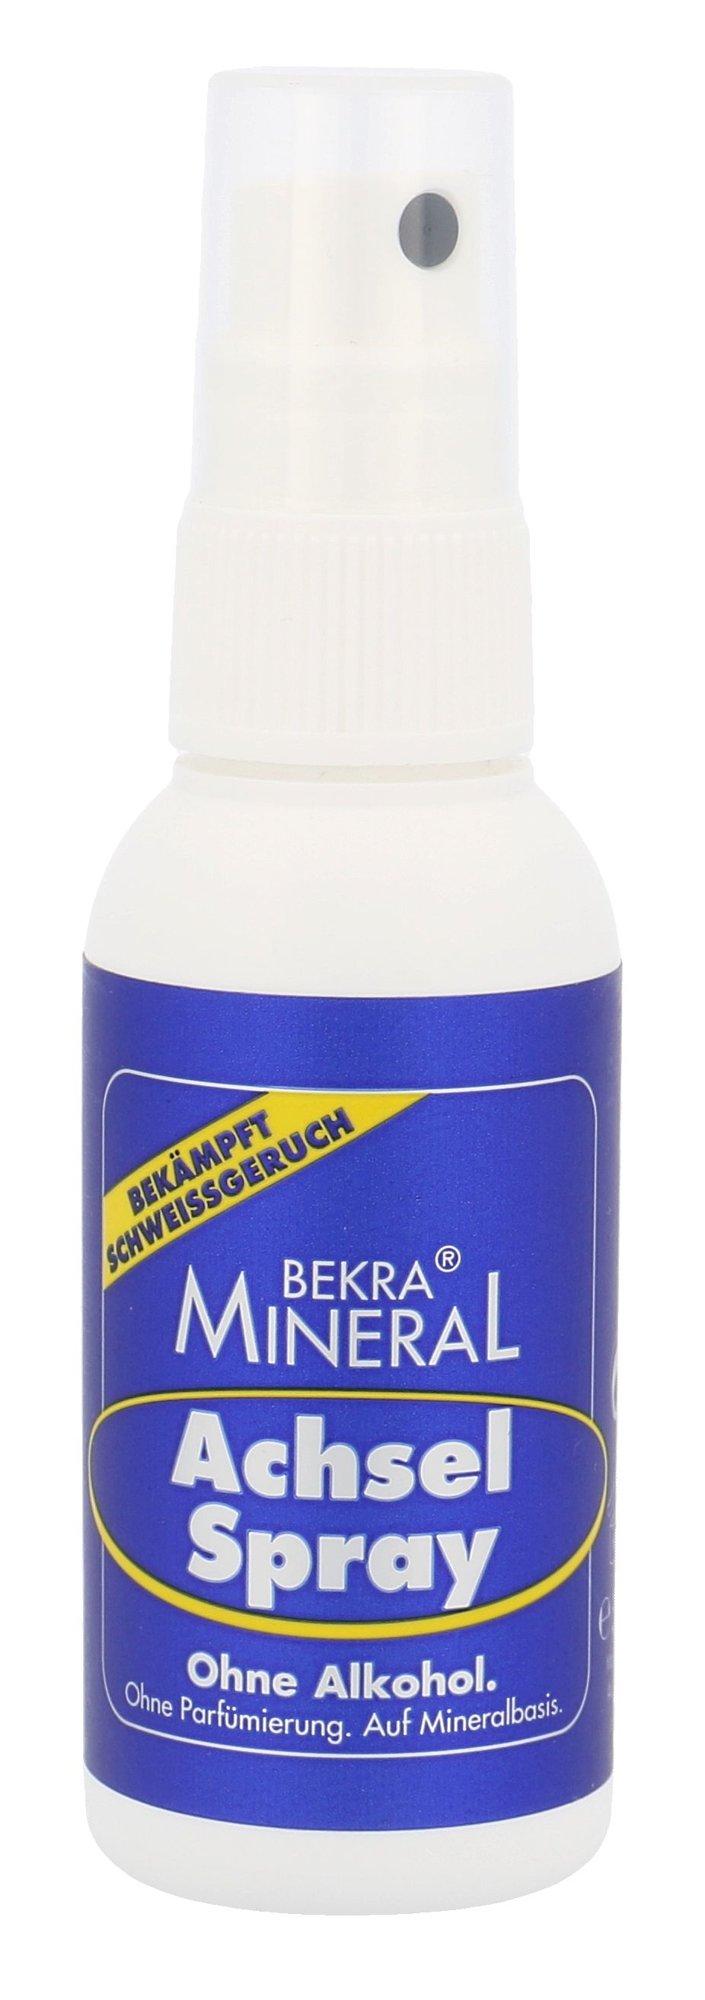 Bekra Mineral Underarm Spray Cosmetic 50ml